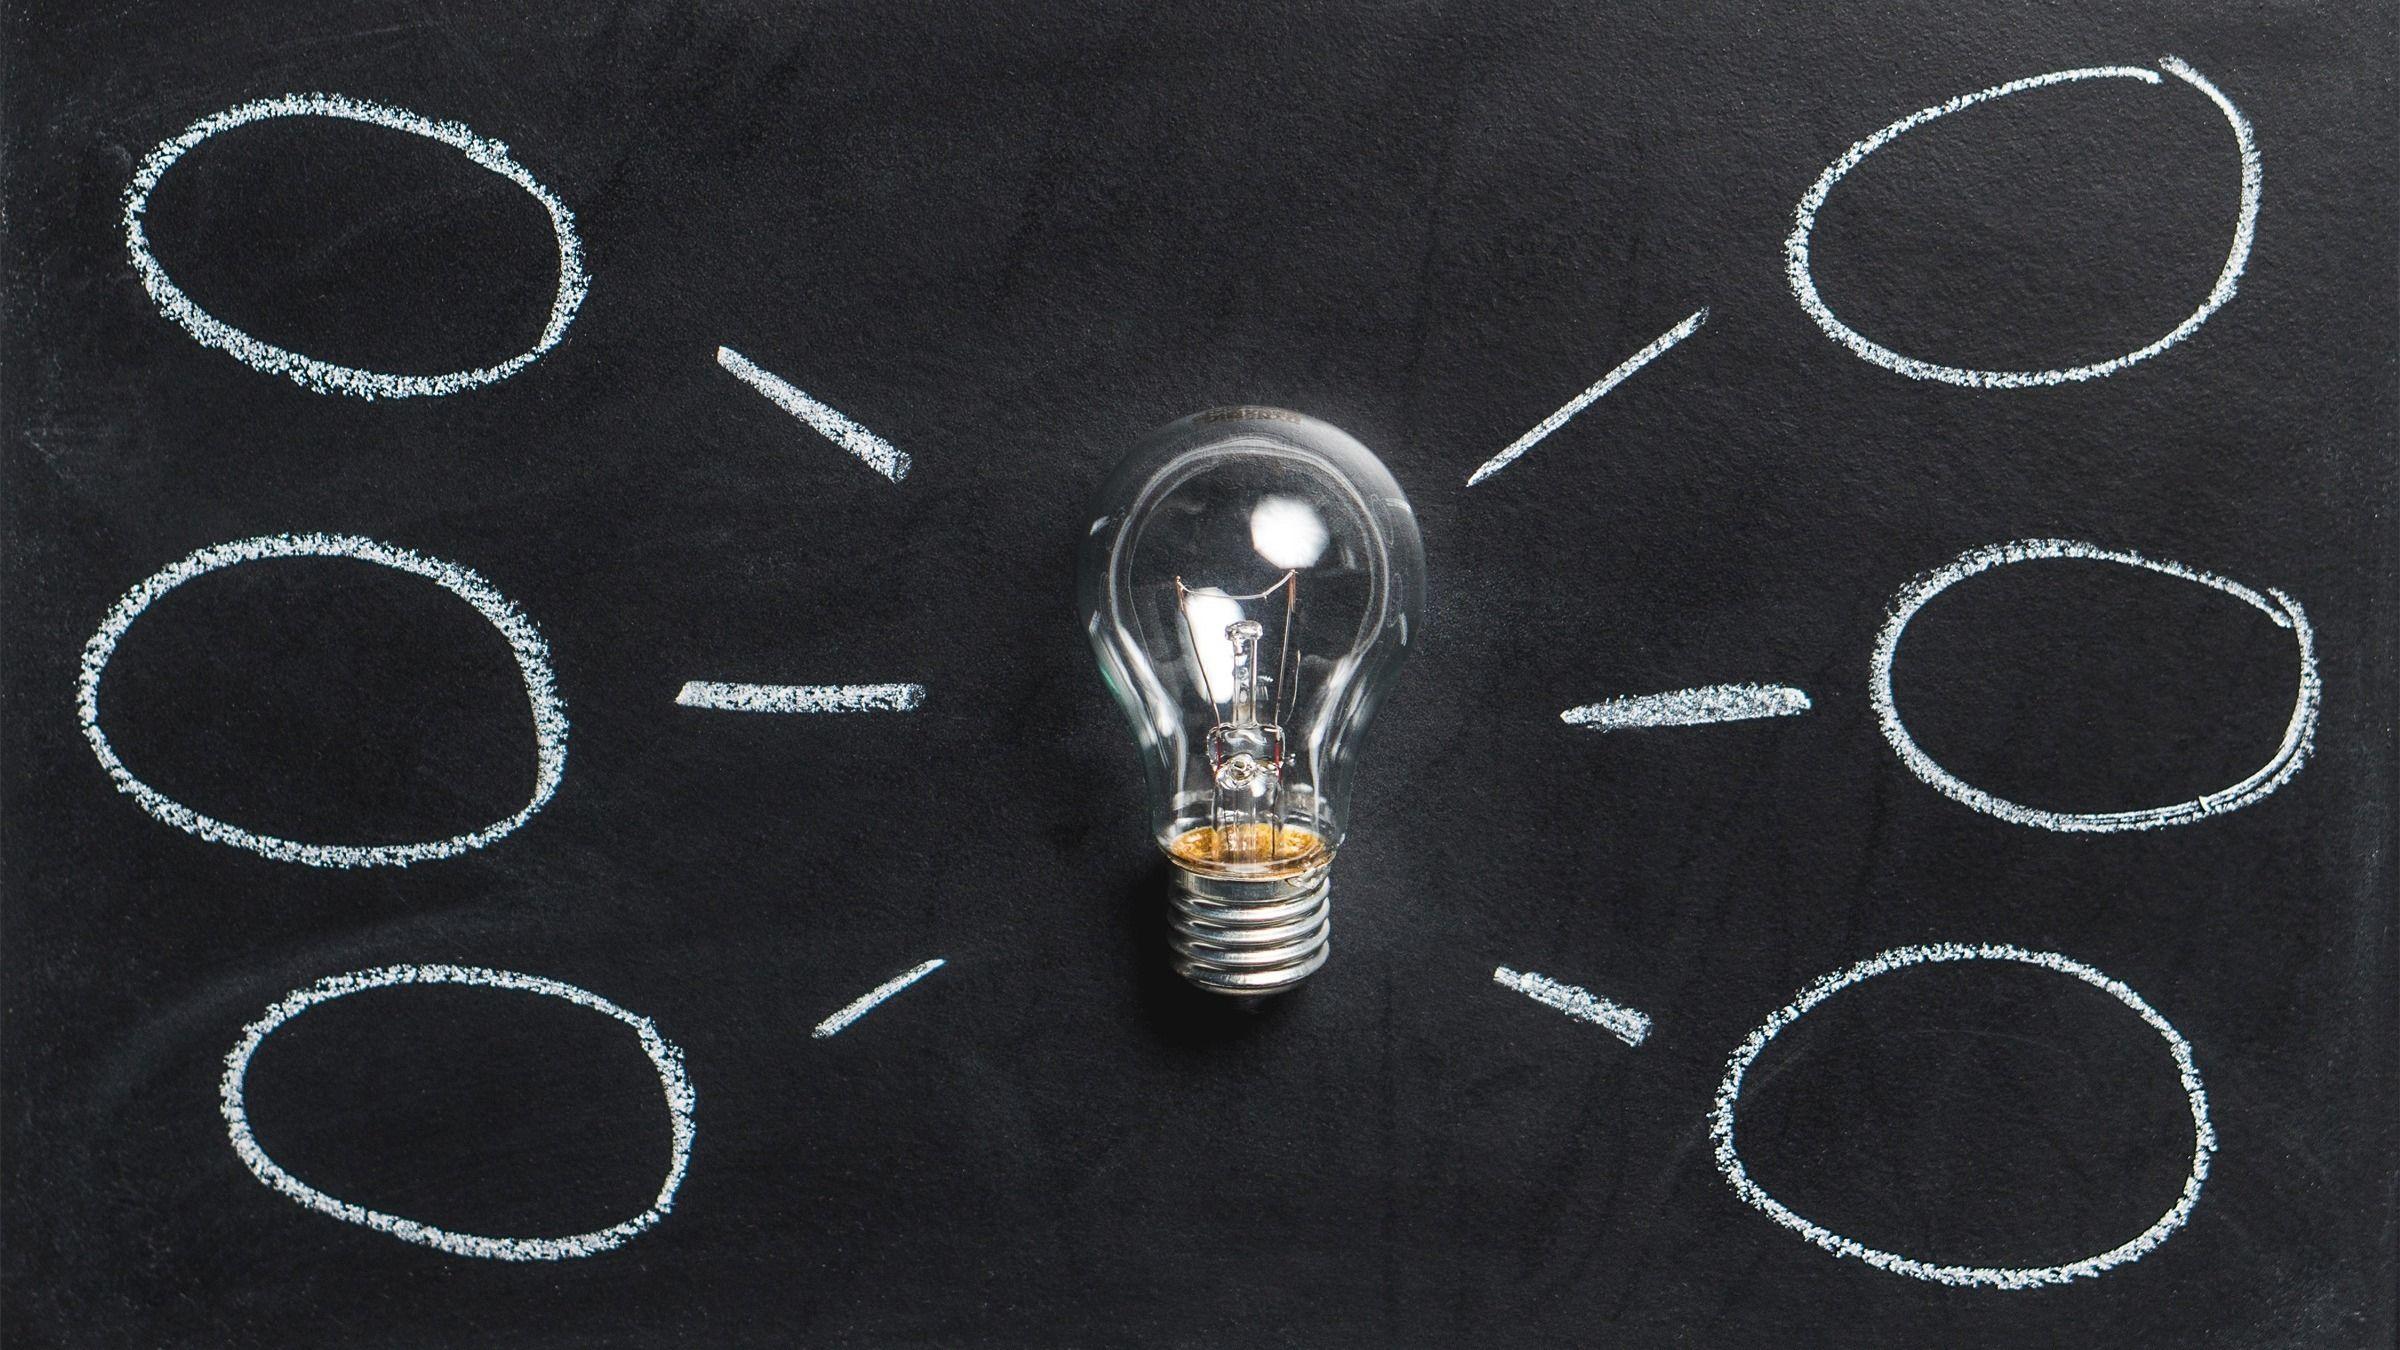 Indie Hackers NYC - Strategy / Growth / Brainstorming